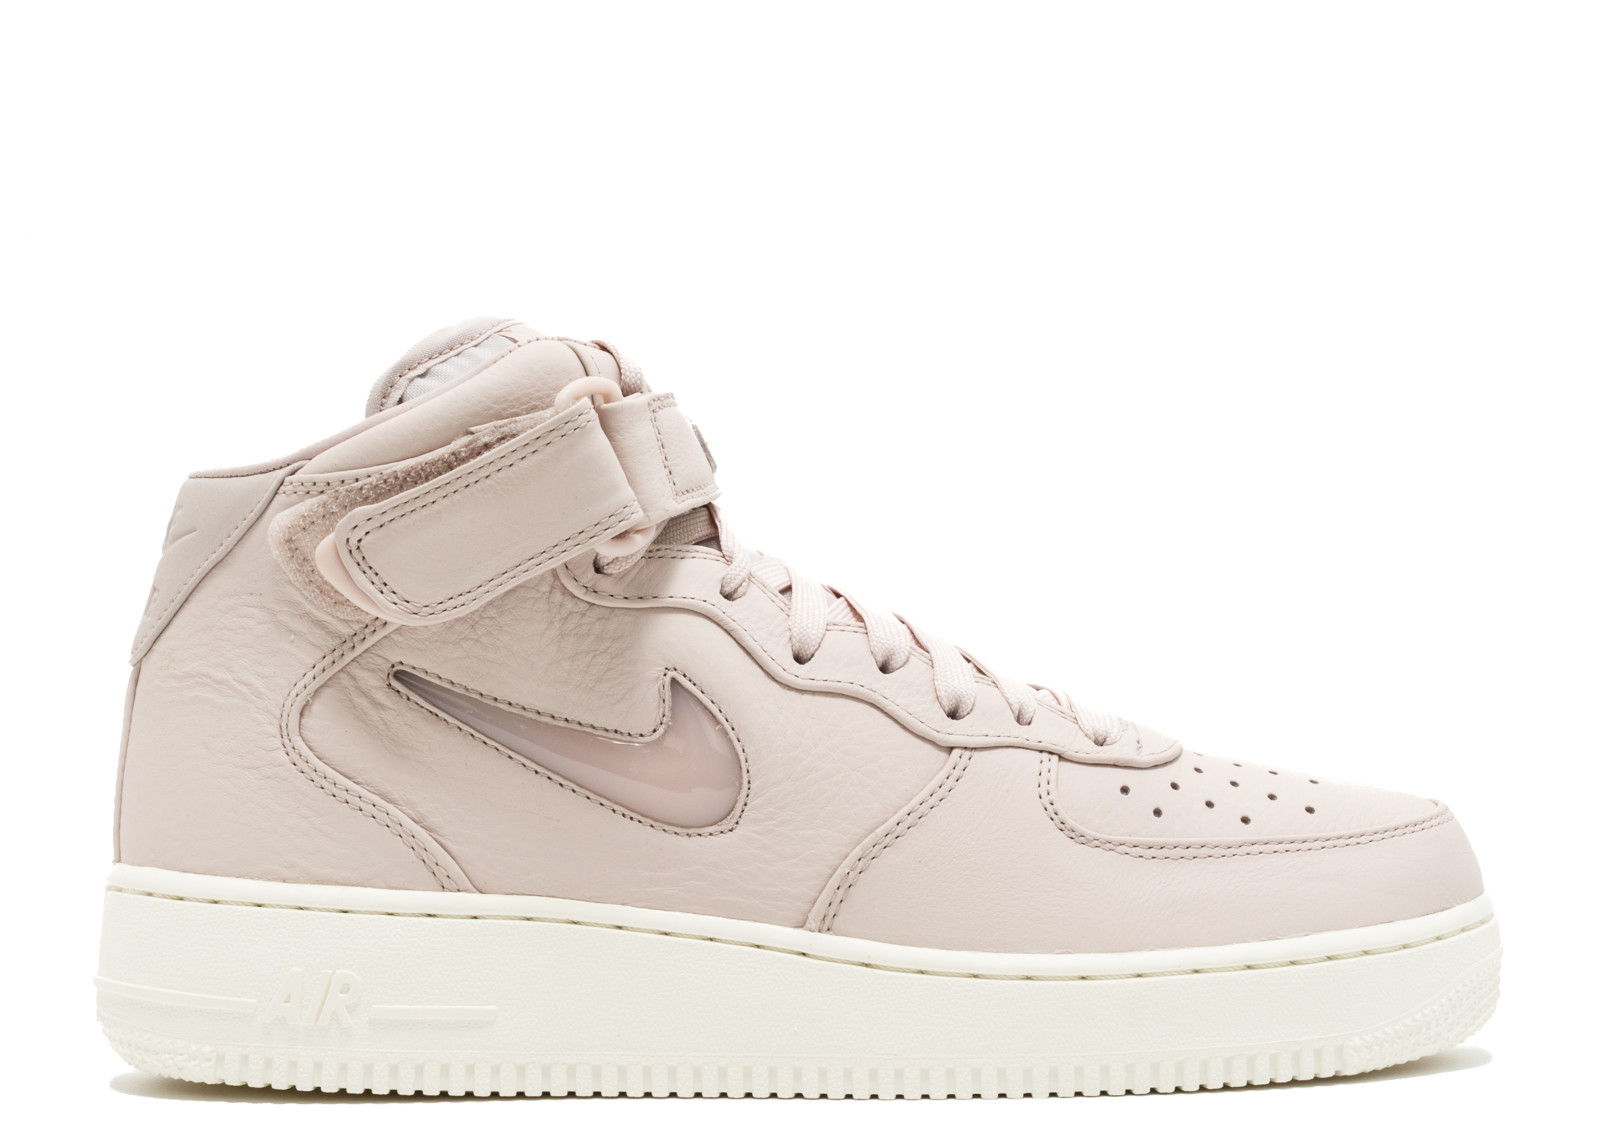 Nike Air Force 1 Mid Retro Prm Mens Style : 941913